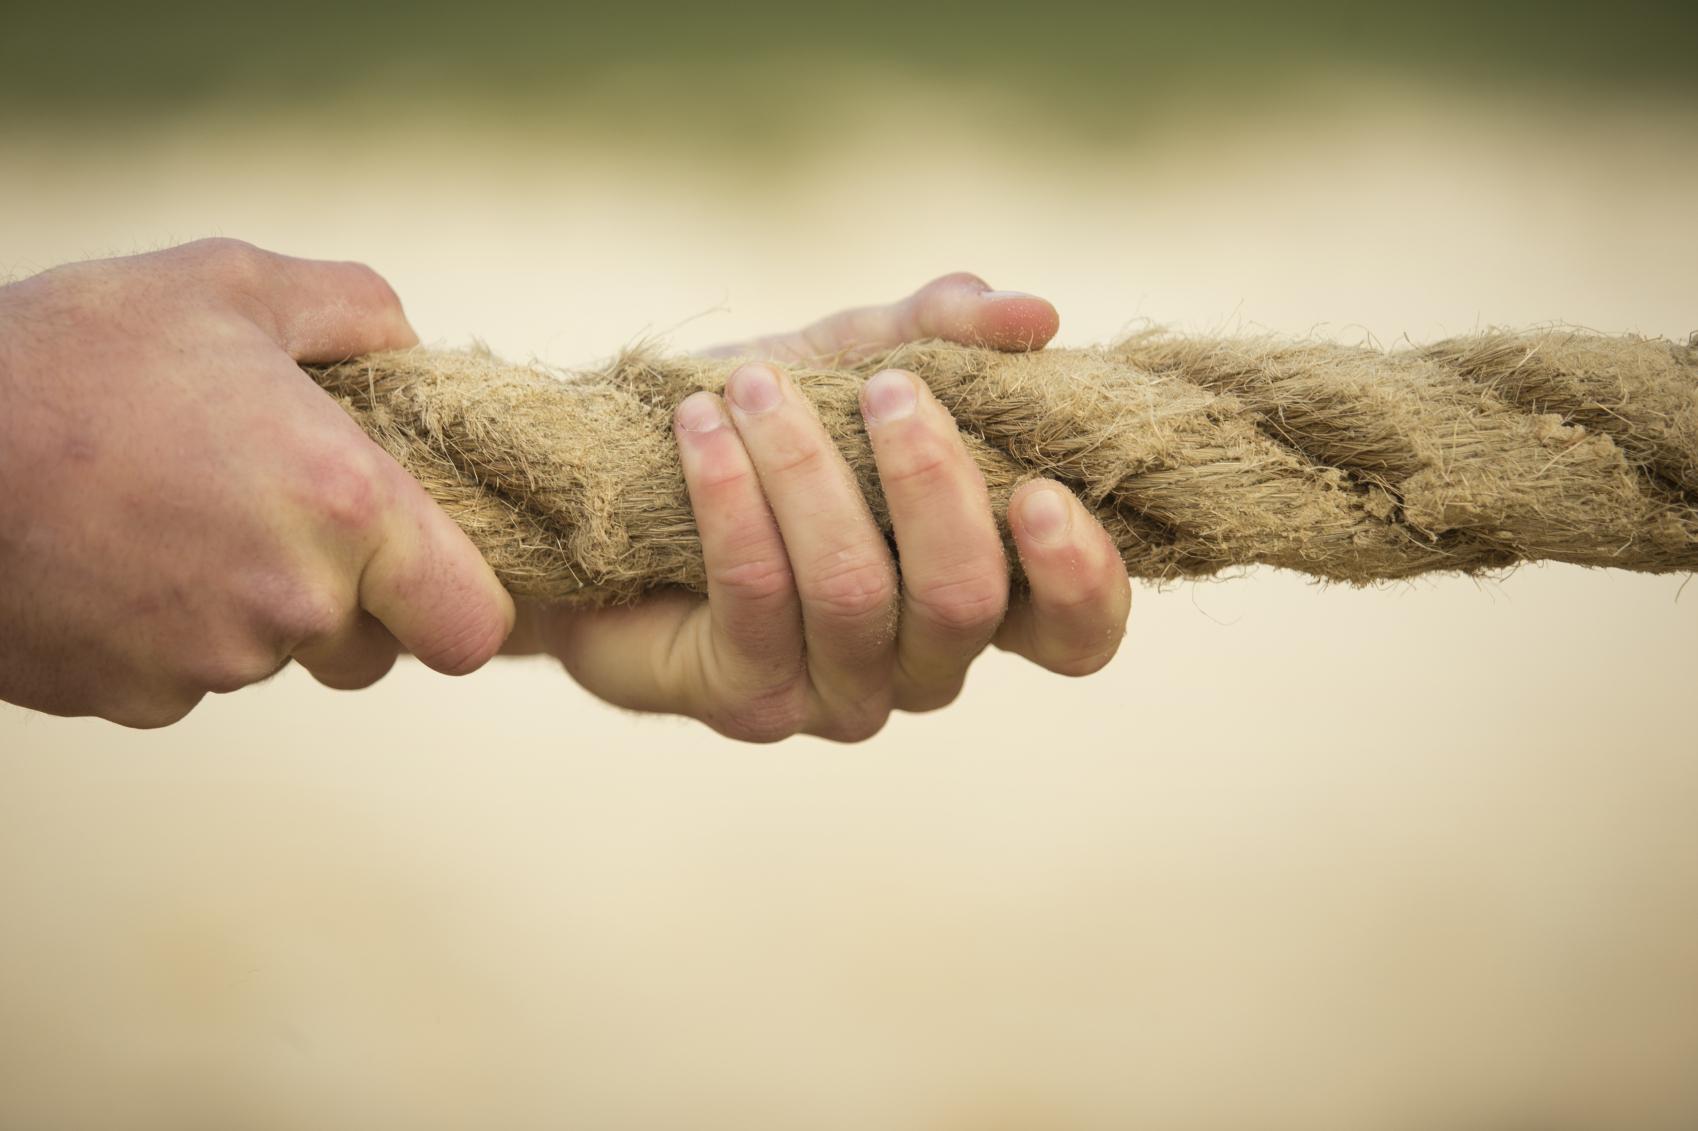 Drawn rope hand holding Media Ikon On Bank